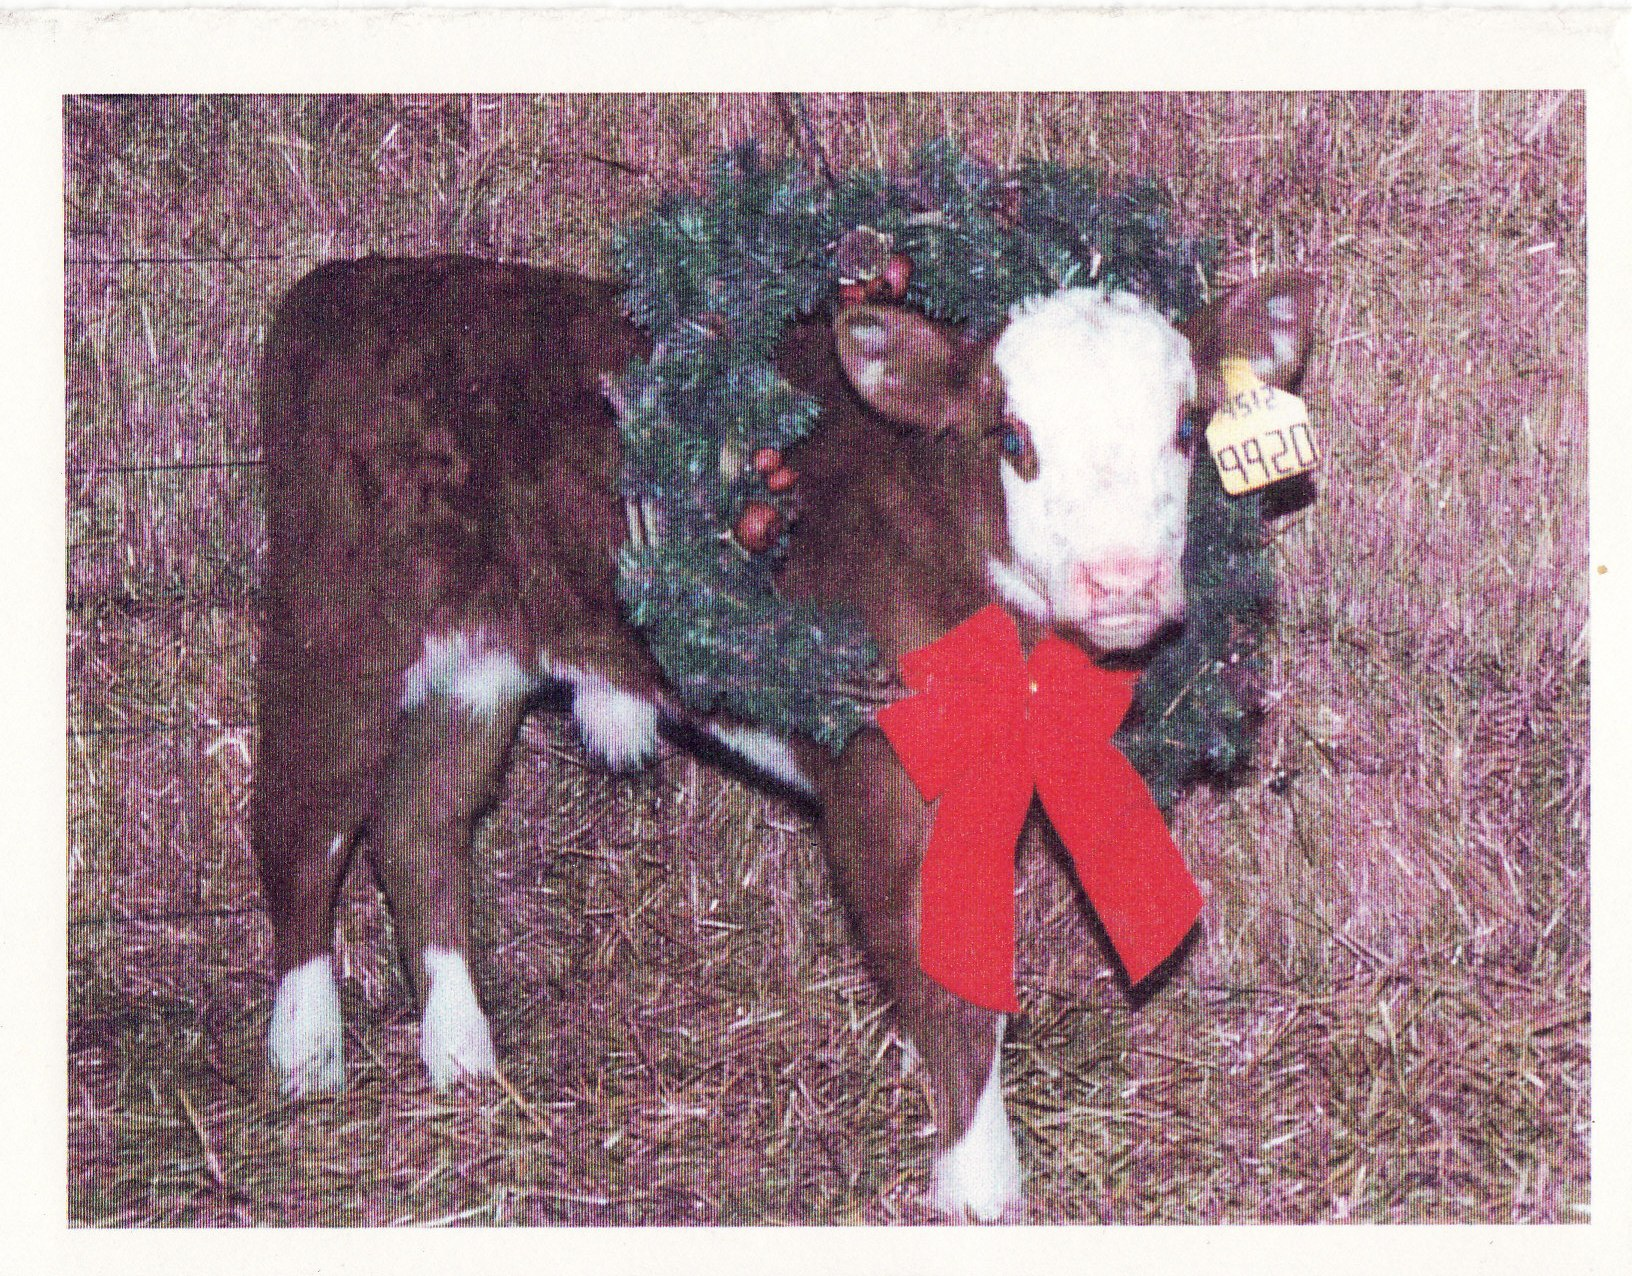 Coley Christmas card 1999